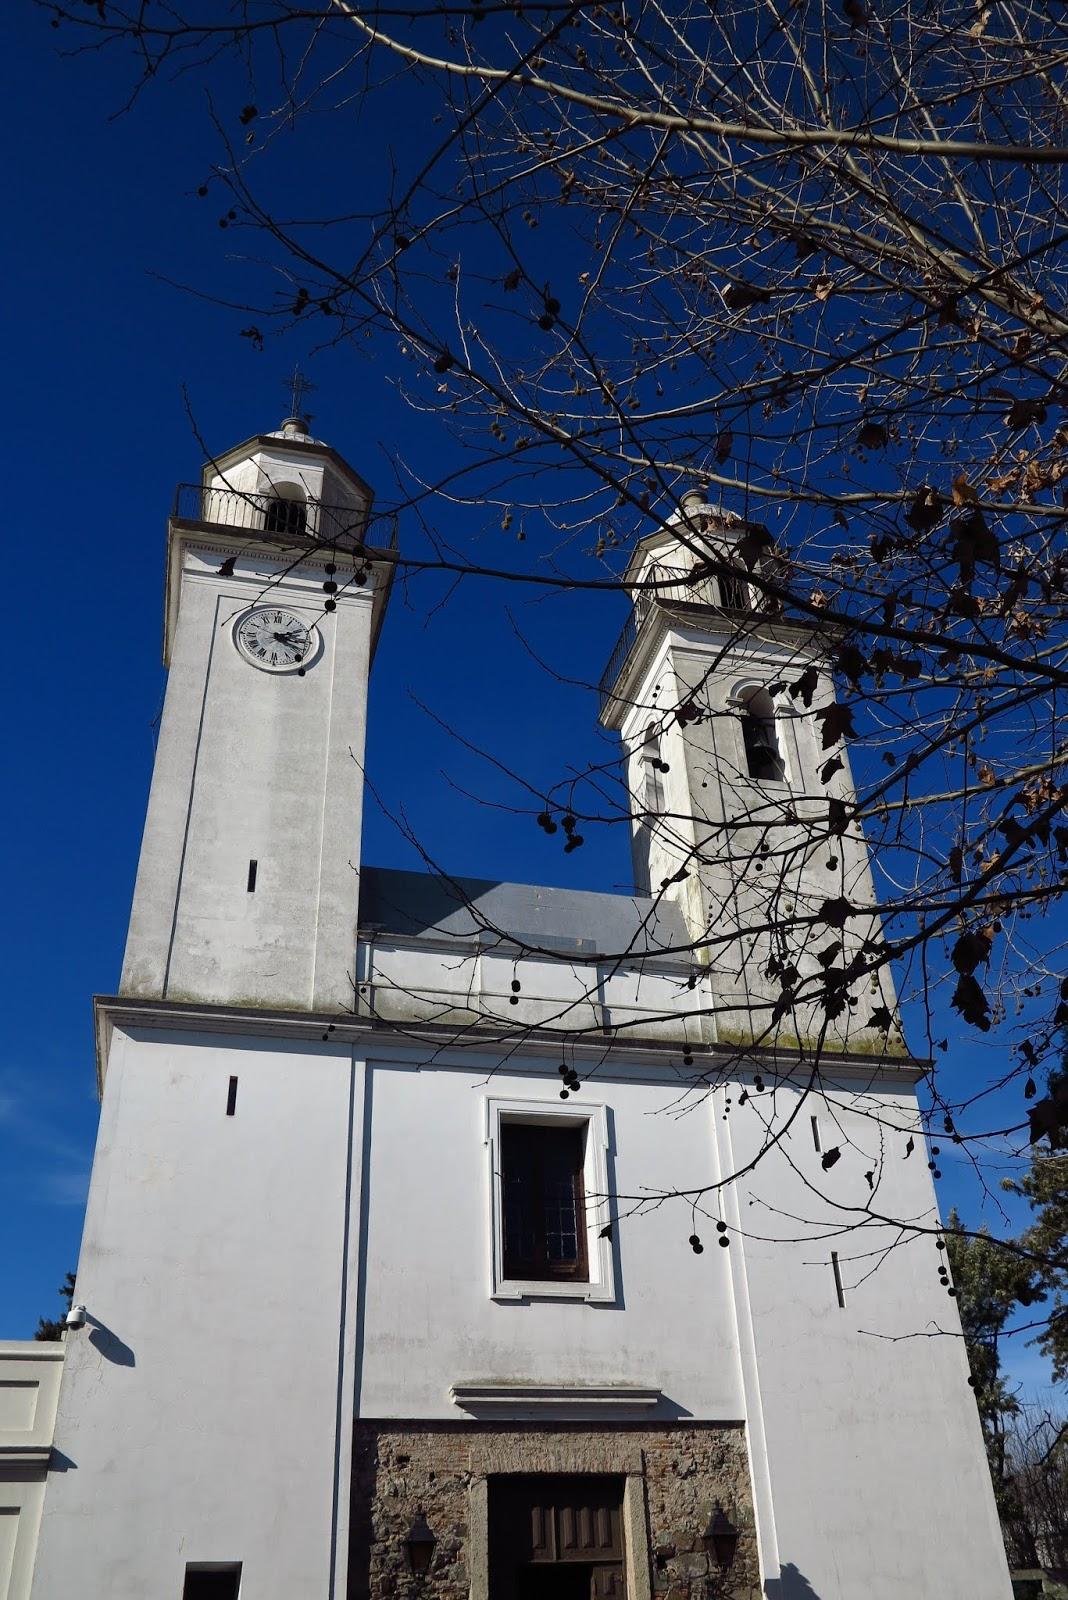 Basílica do Santíssimo Sacramento - Colonia del Sacramento